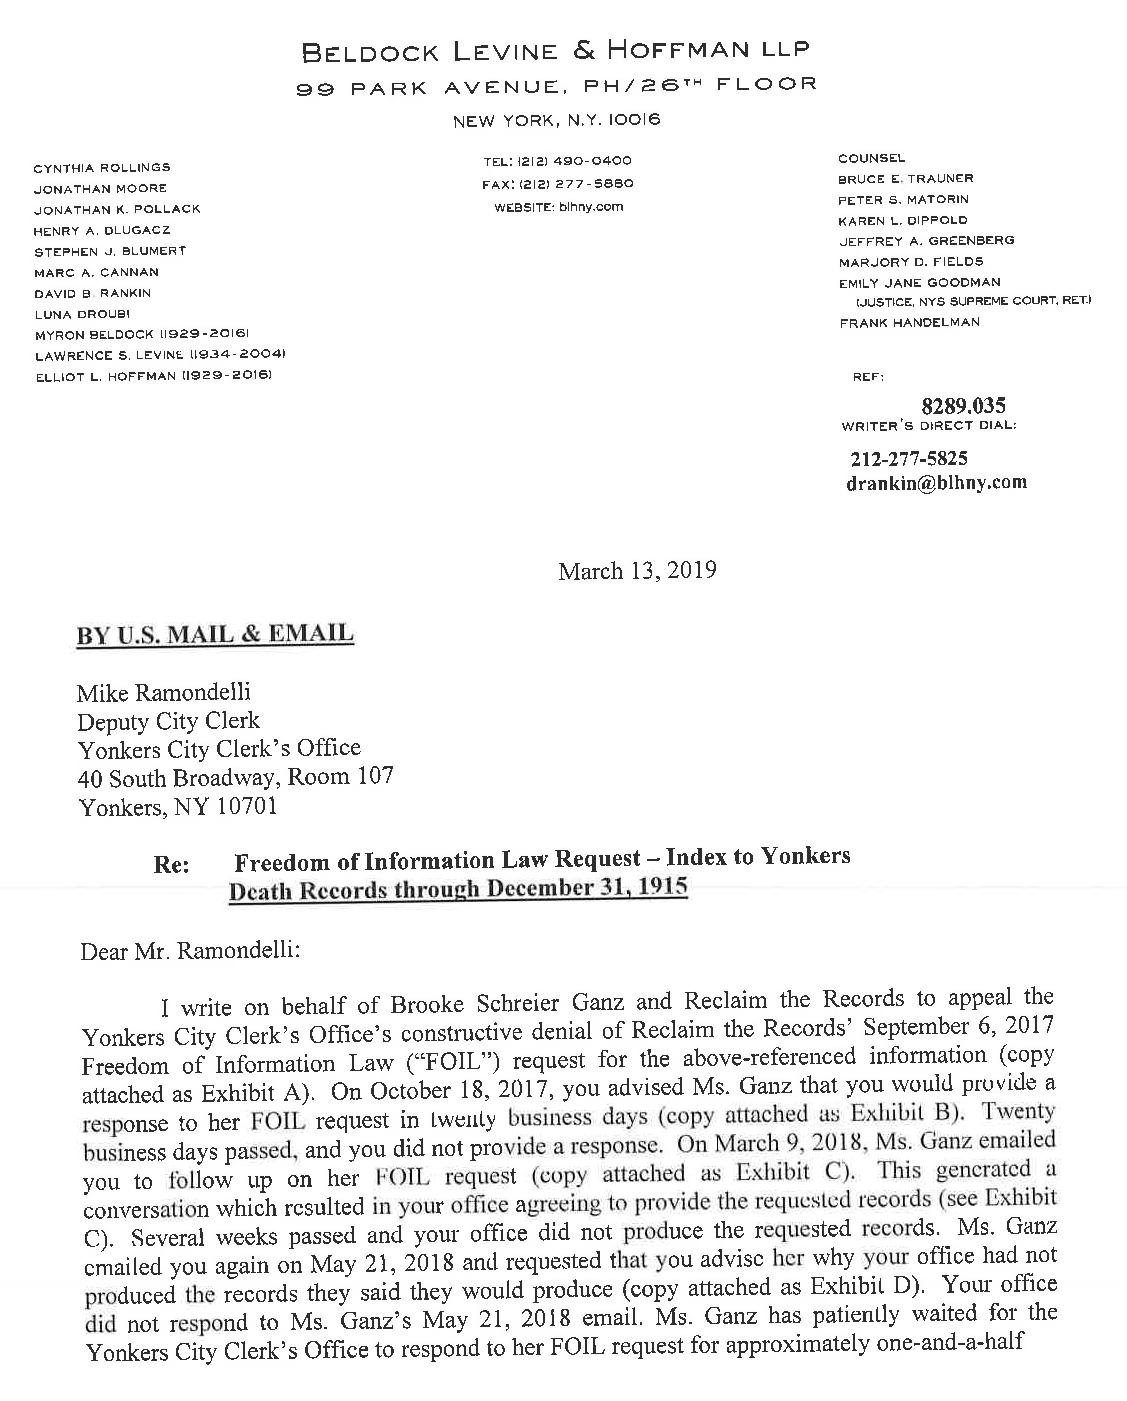 FOIL Appeal Letter (March 13, 2019)